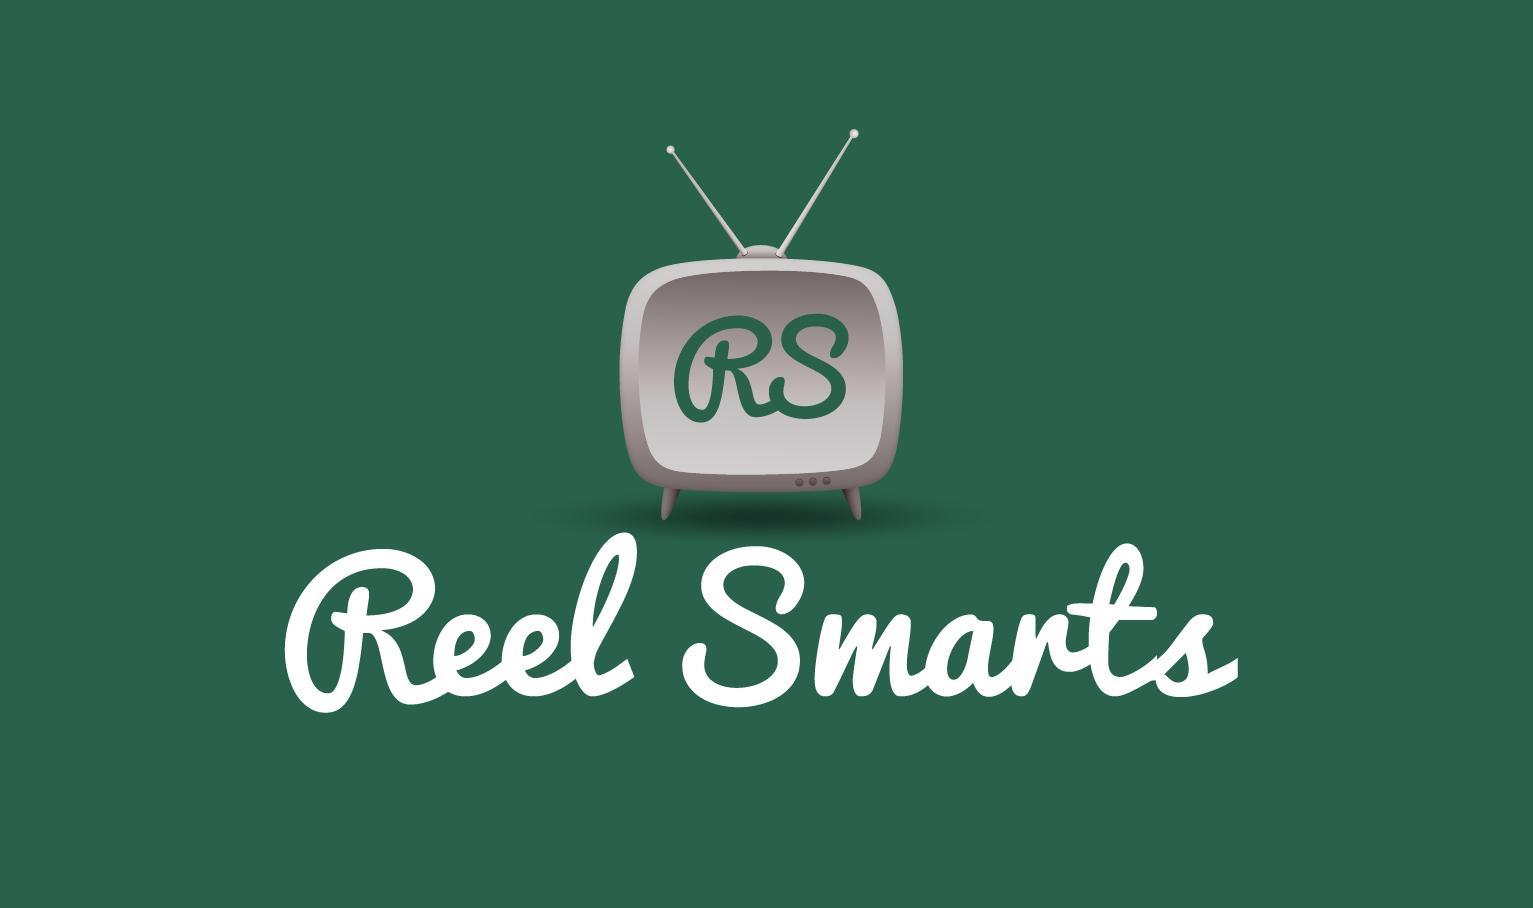 Reel Smarts